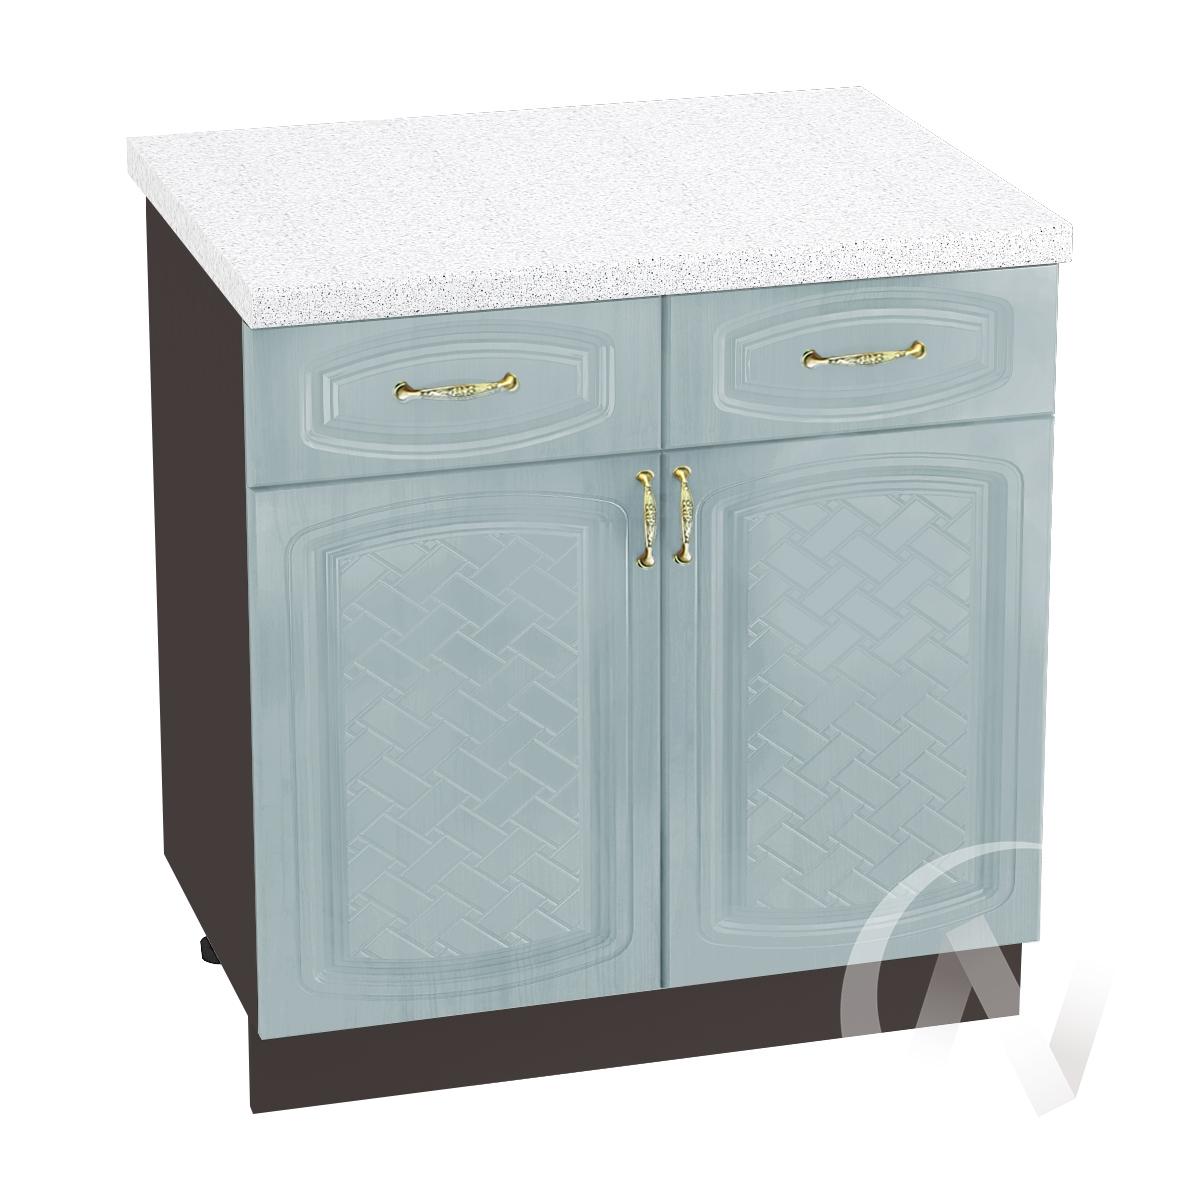 "Кухня ""Сити"": Шкаф нижний с ящиками 800, ШН1Я 800 (корпус венге)"